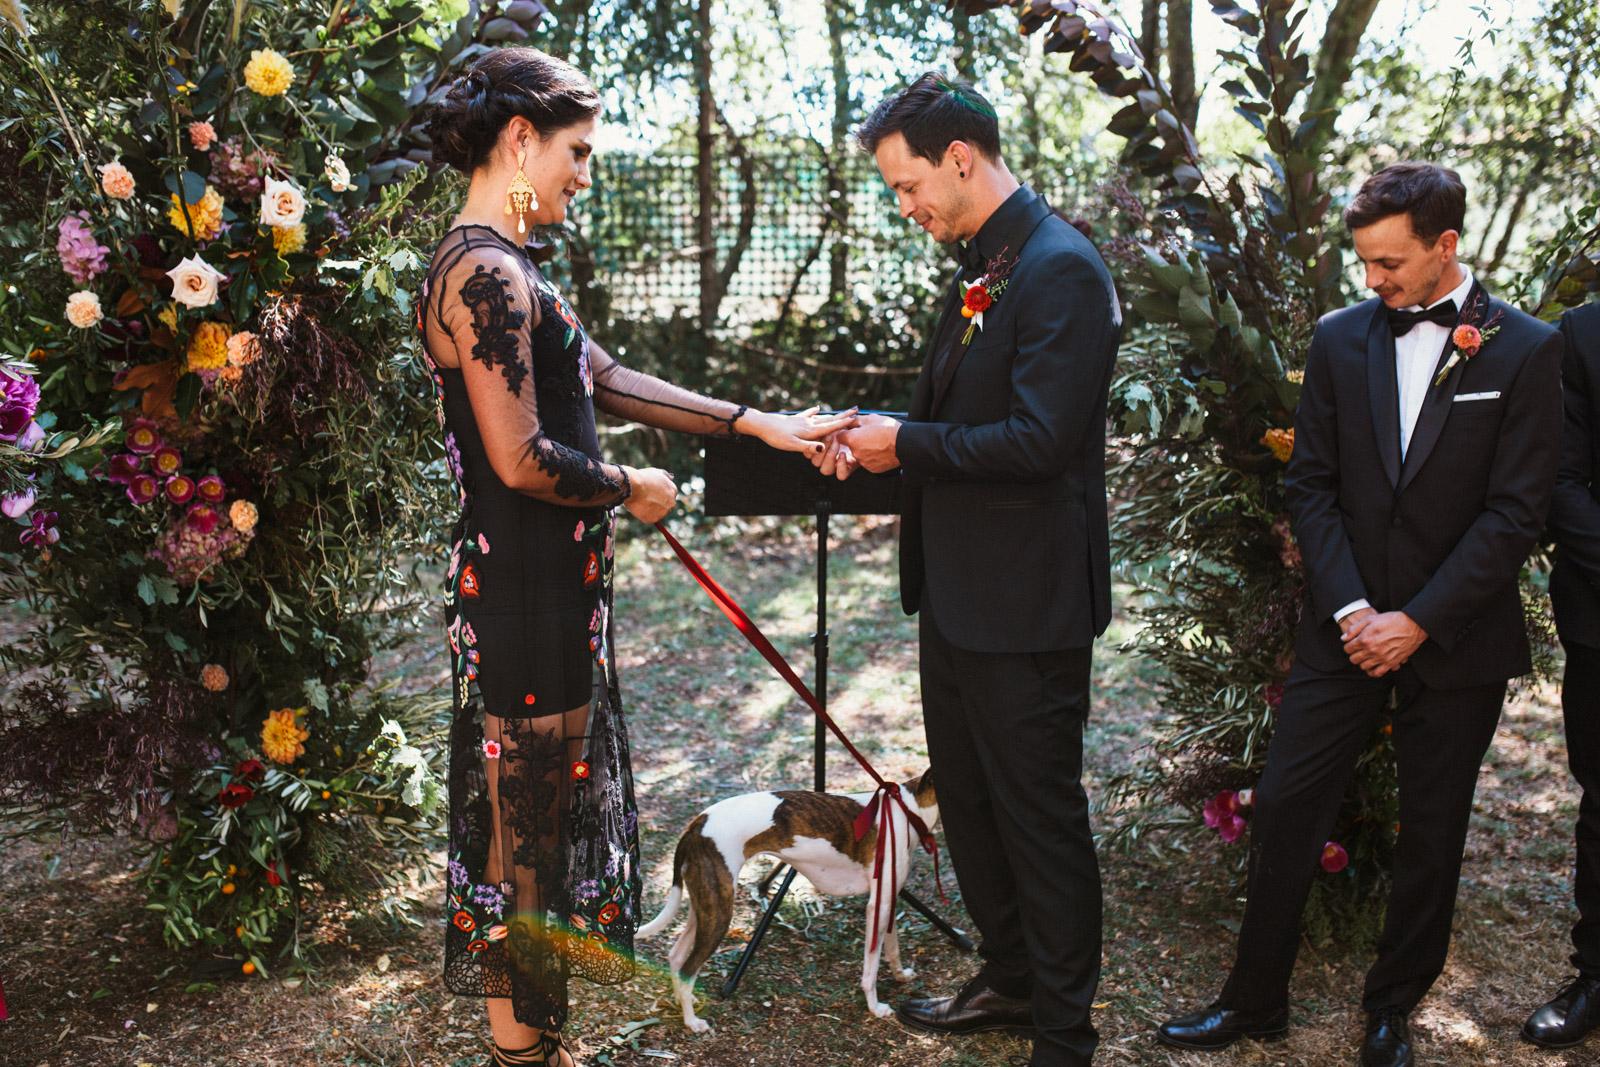 ZD-Melbourne Wedding Photographer-Dean Raphael-48.jpg